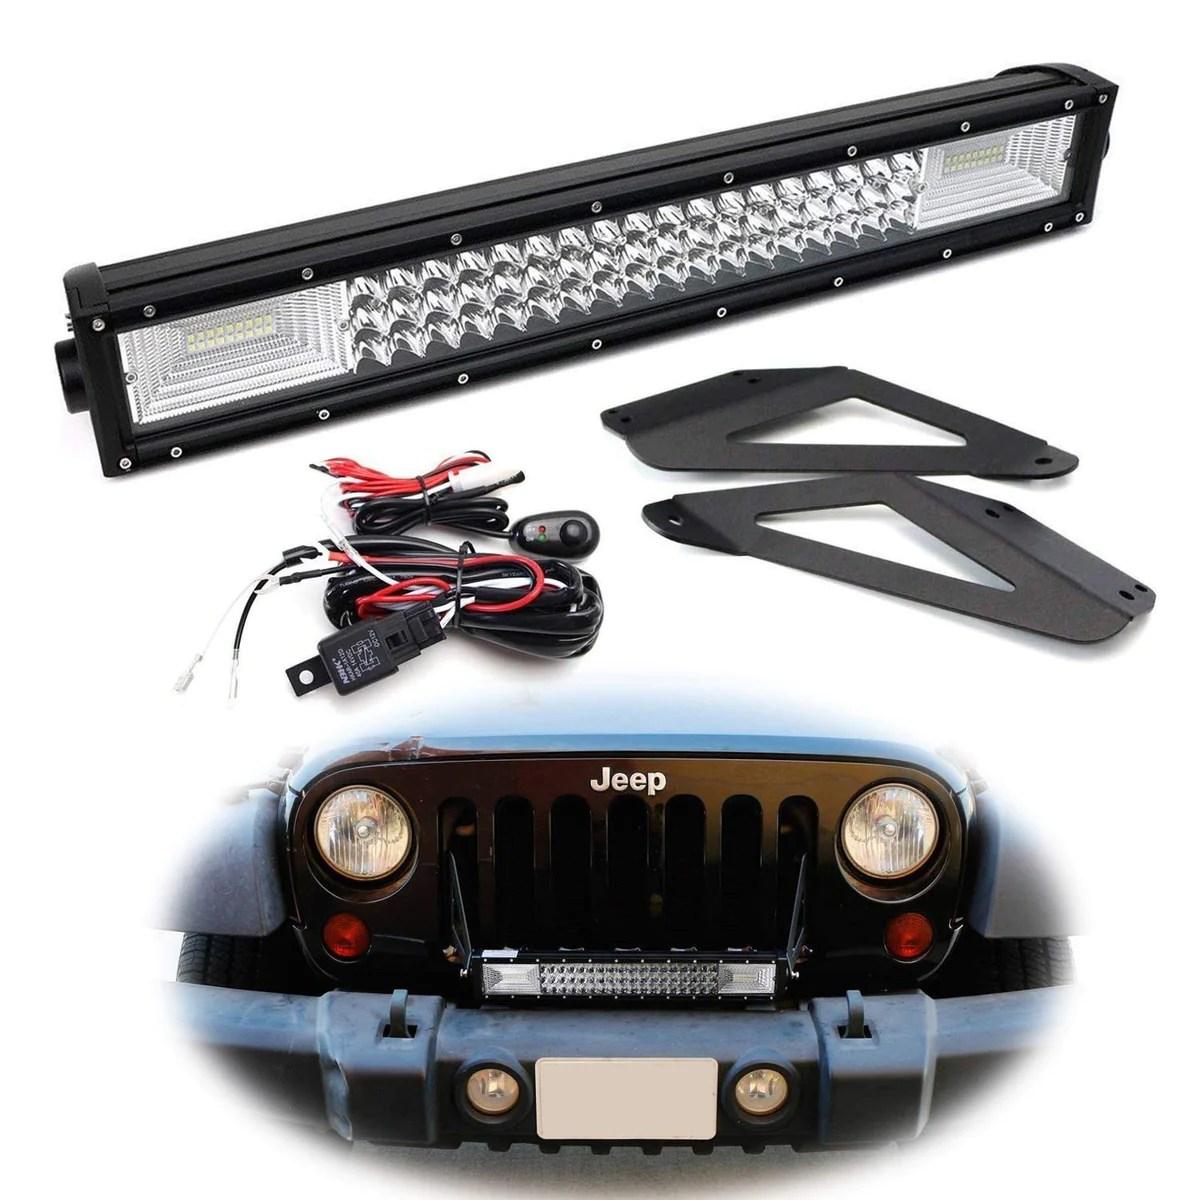 small resolution of 07 17 jeep wrangler jk front grille mount led light bar kit ijdmtoy com